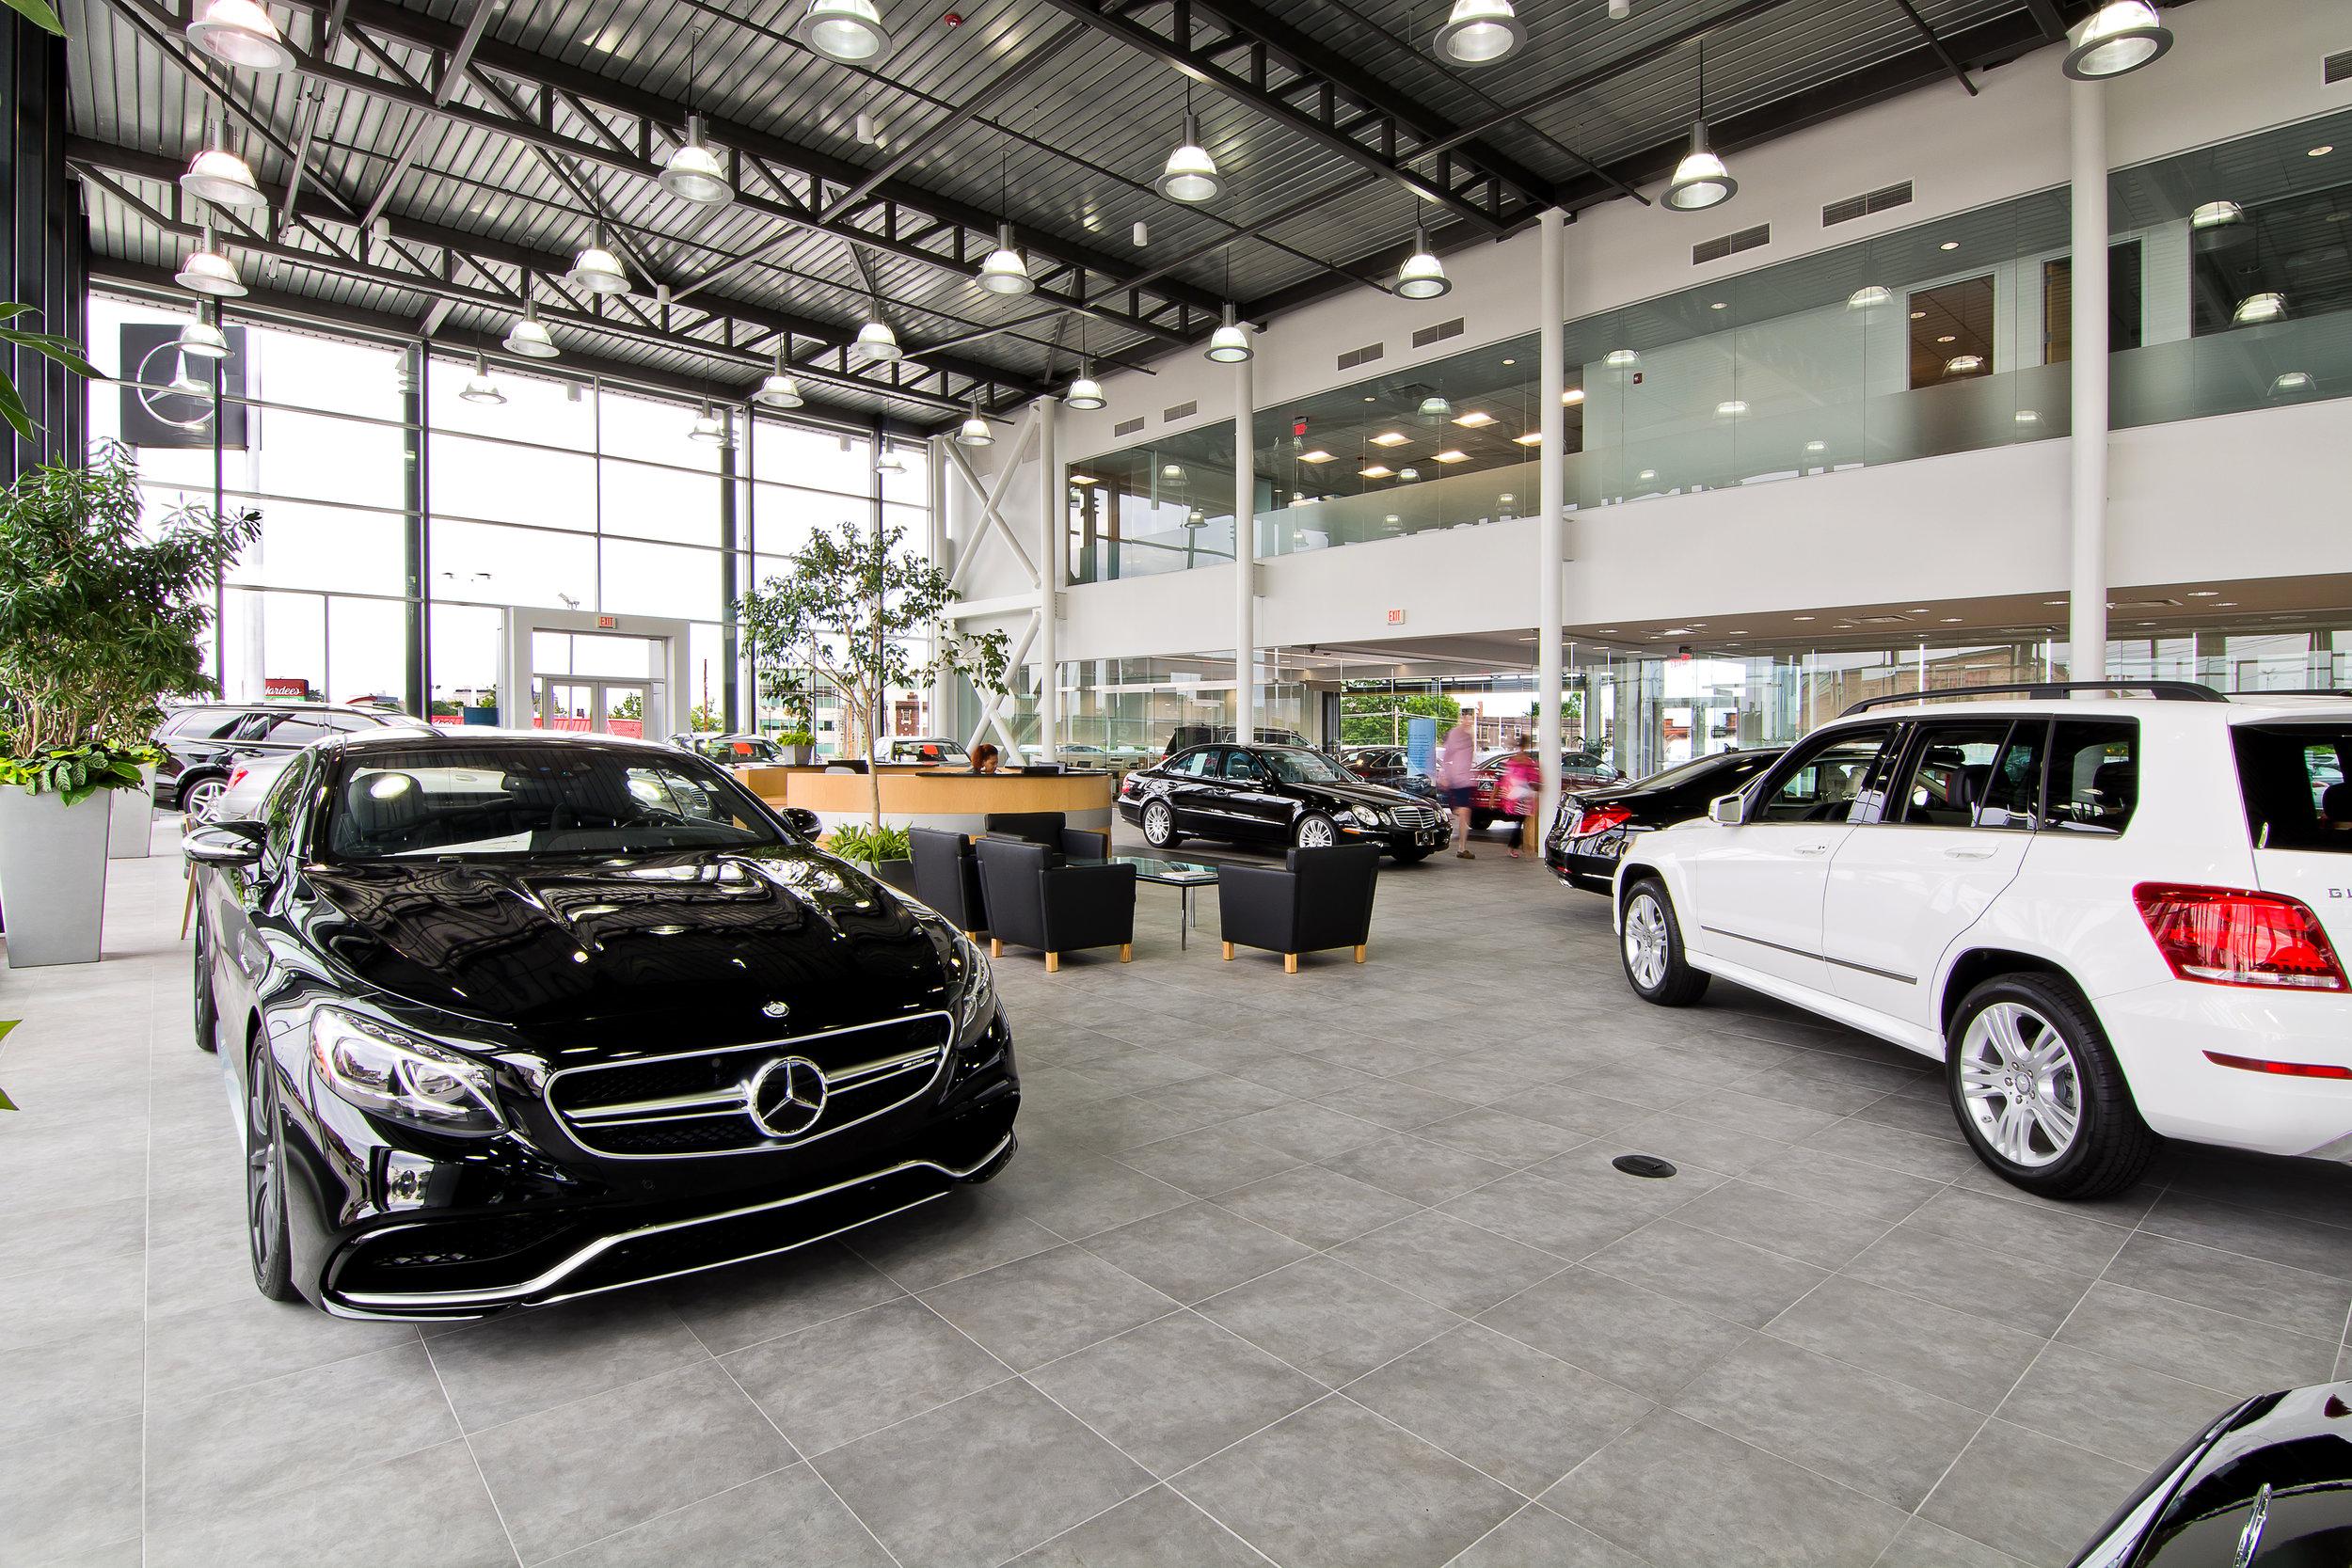 Mercedes Benz - STL (15 of 28).jpg